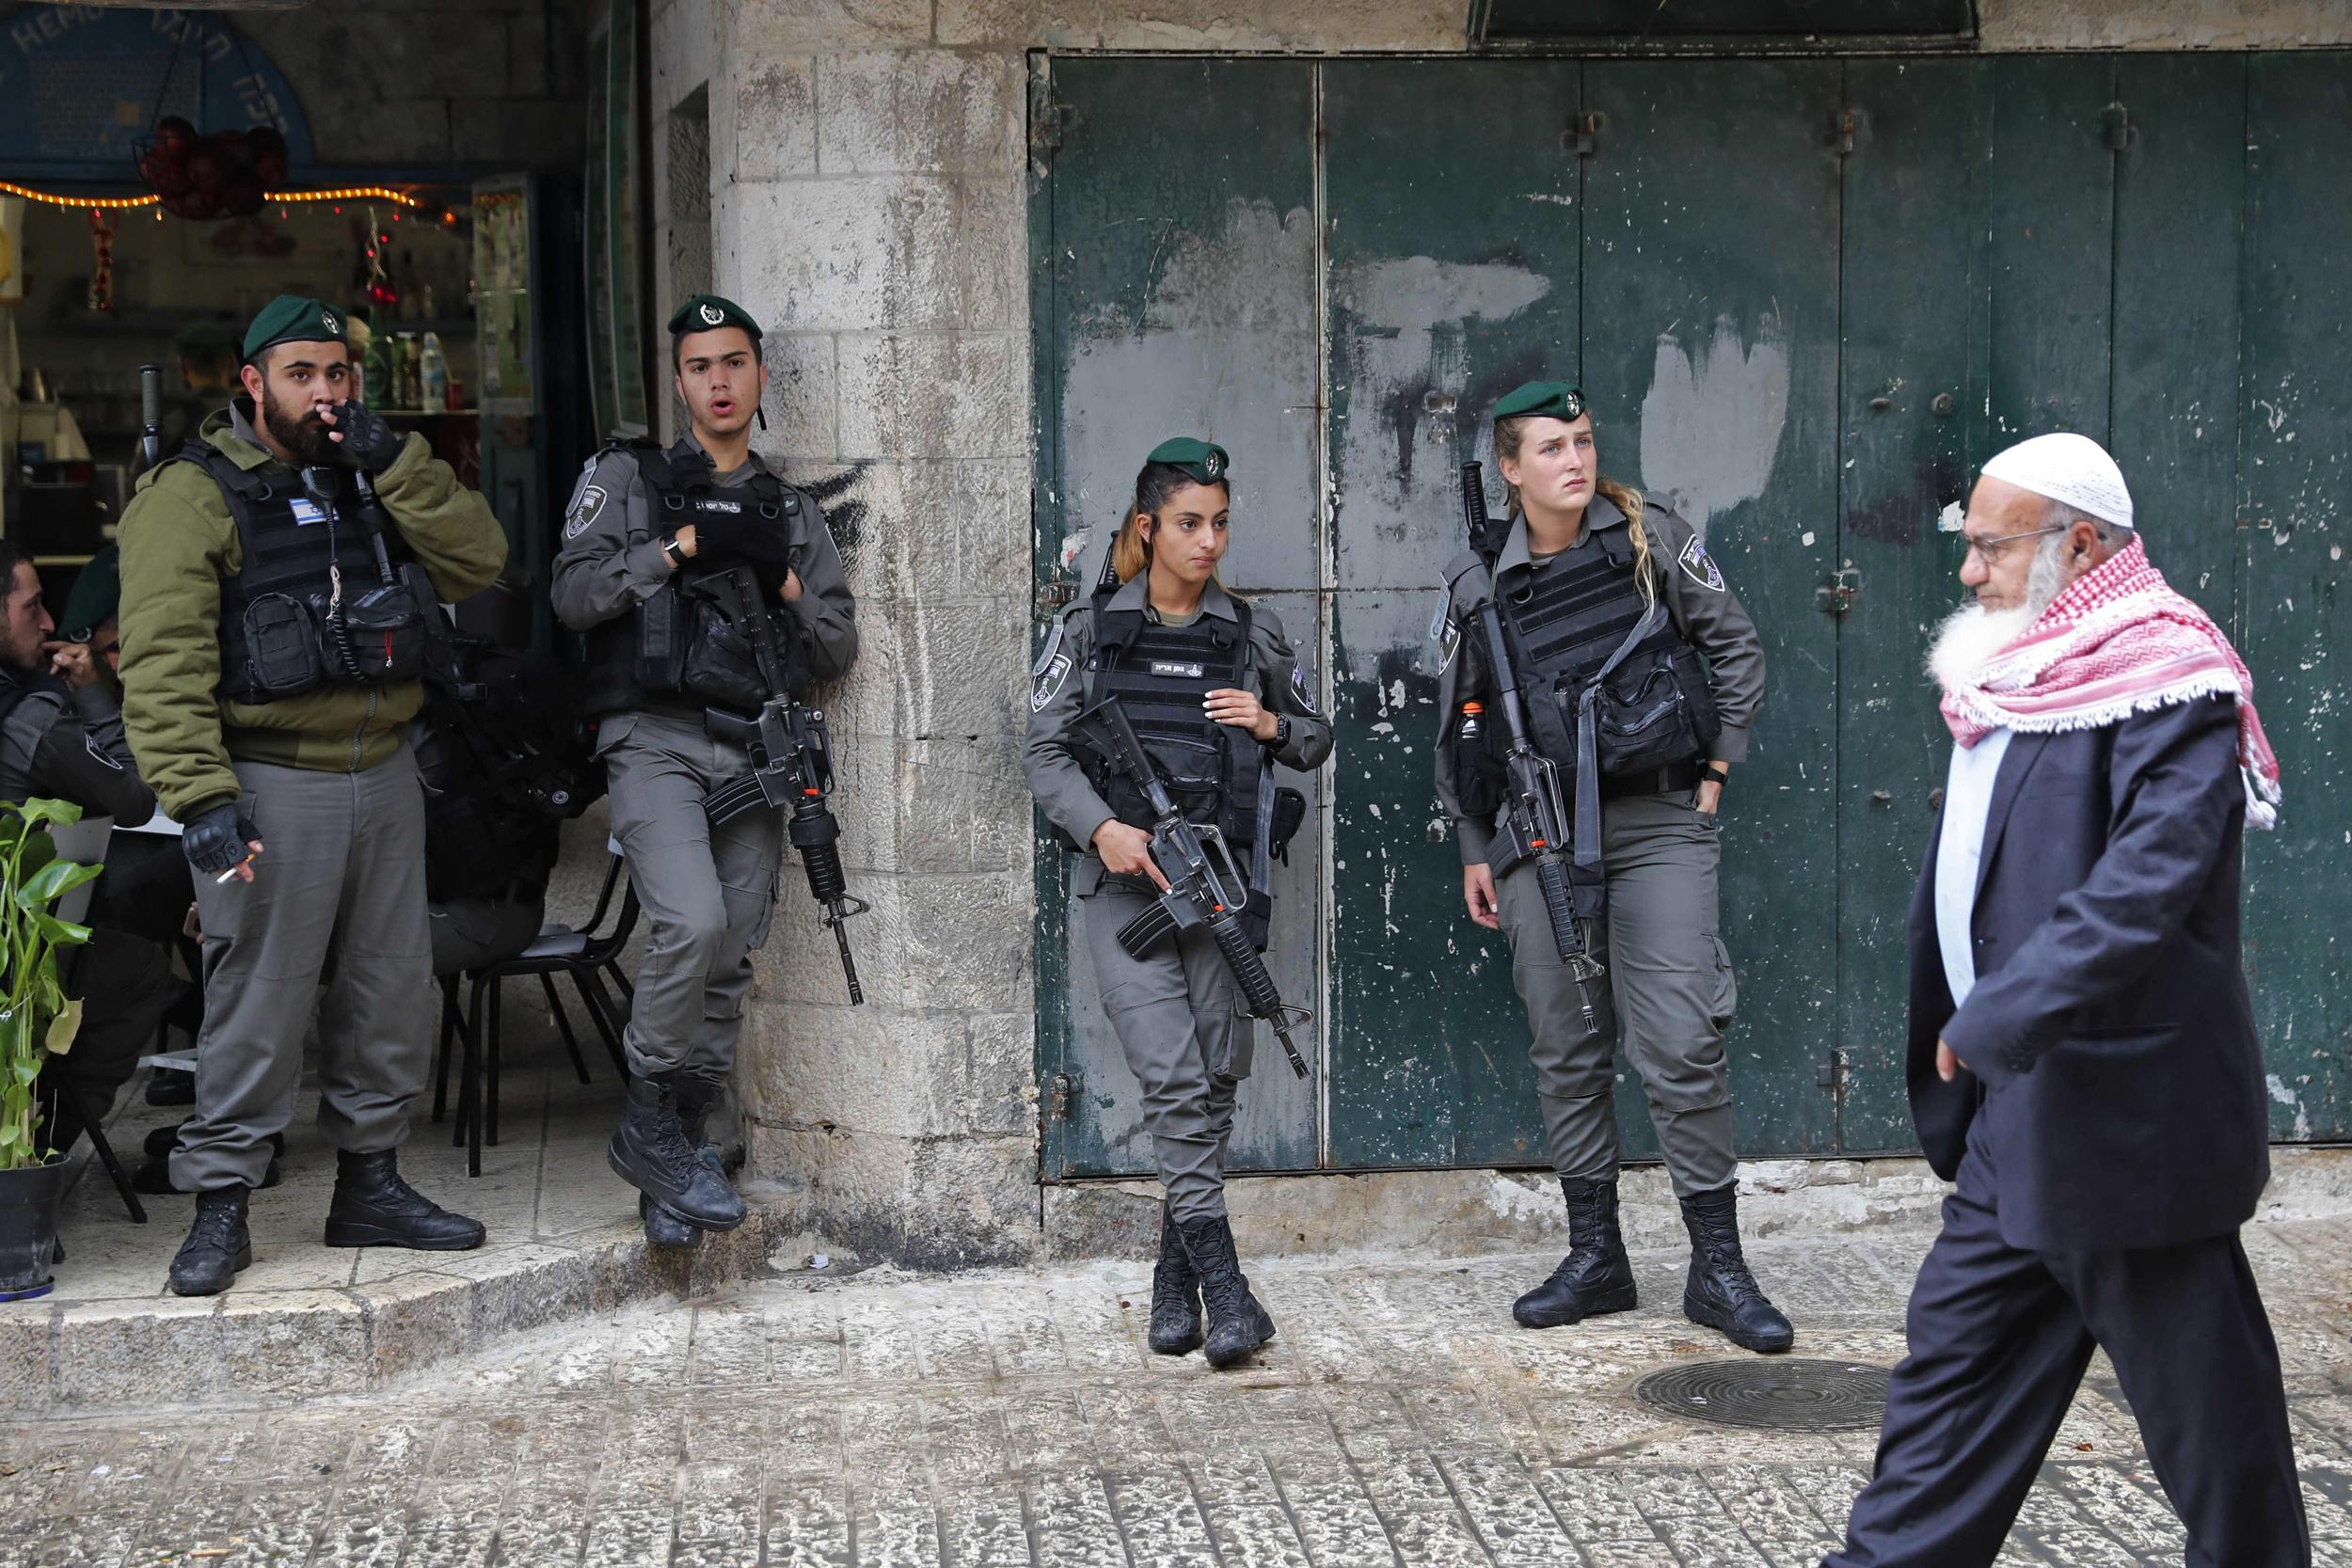 Image: A Palestinian man walks past Israeli border guards in Jerusalem's Old City